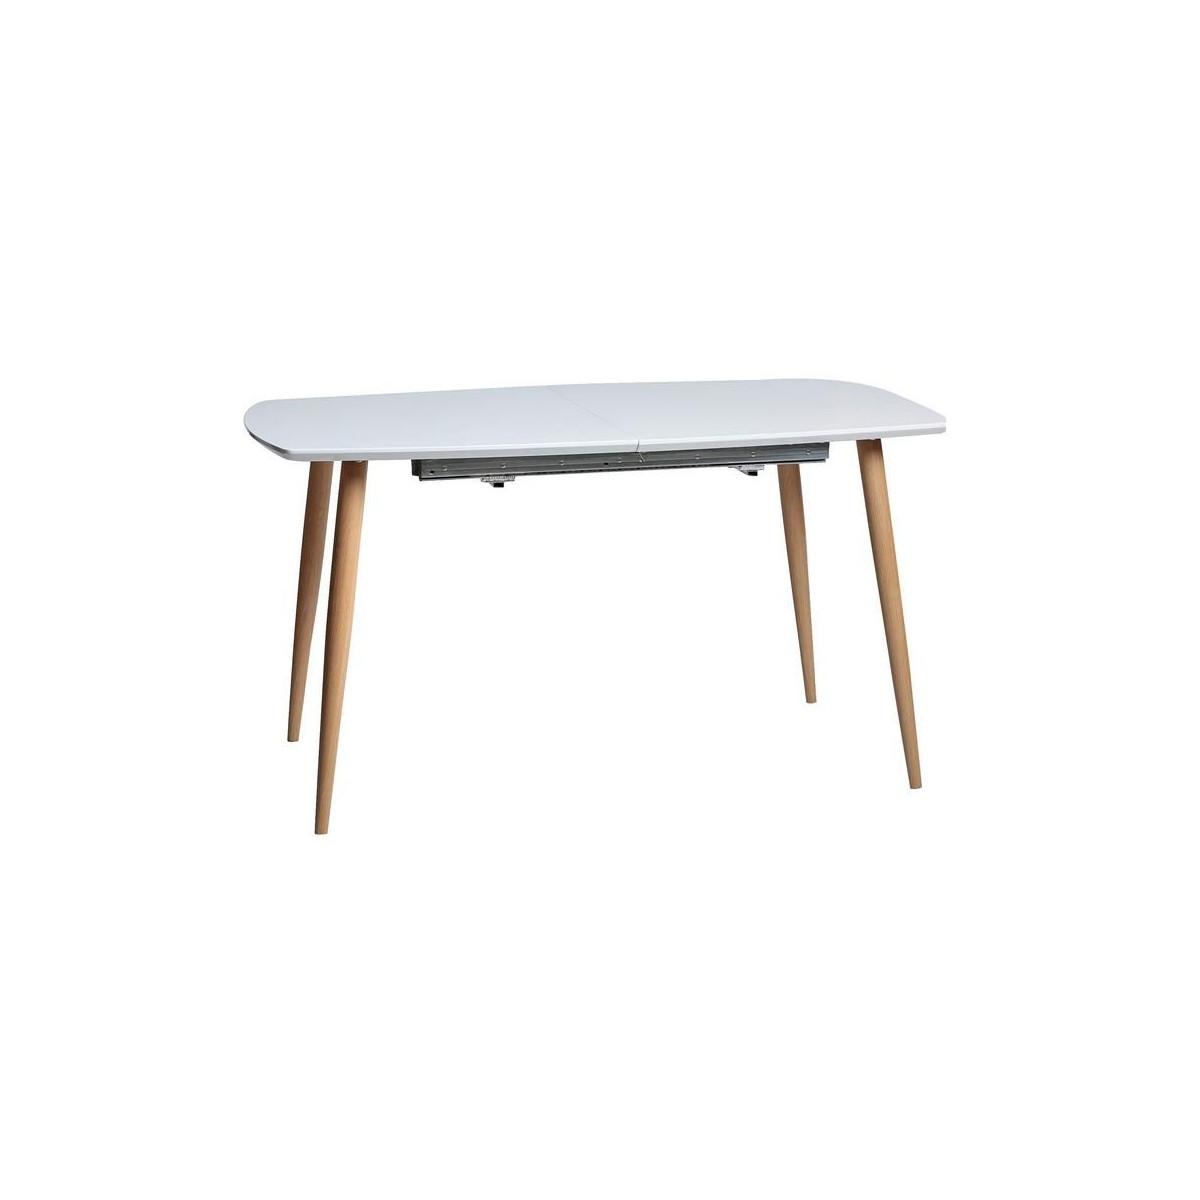 Mesa de comedor extensible n rdica blanca de marckeric lena for Mesa comedor blanca extensible